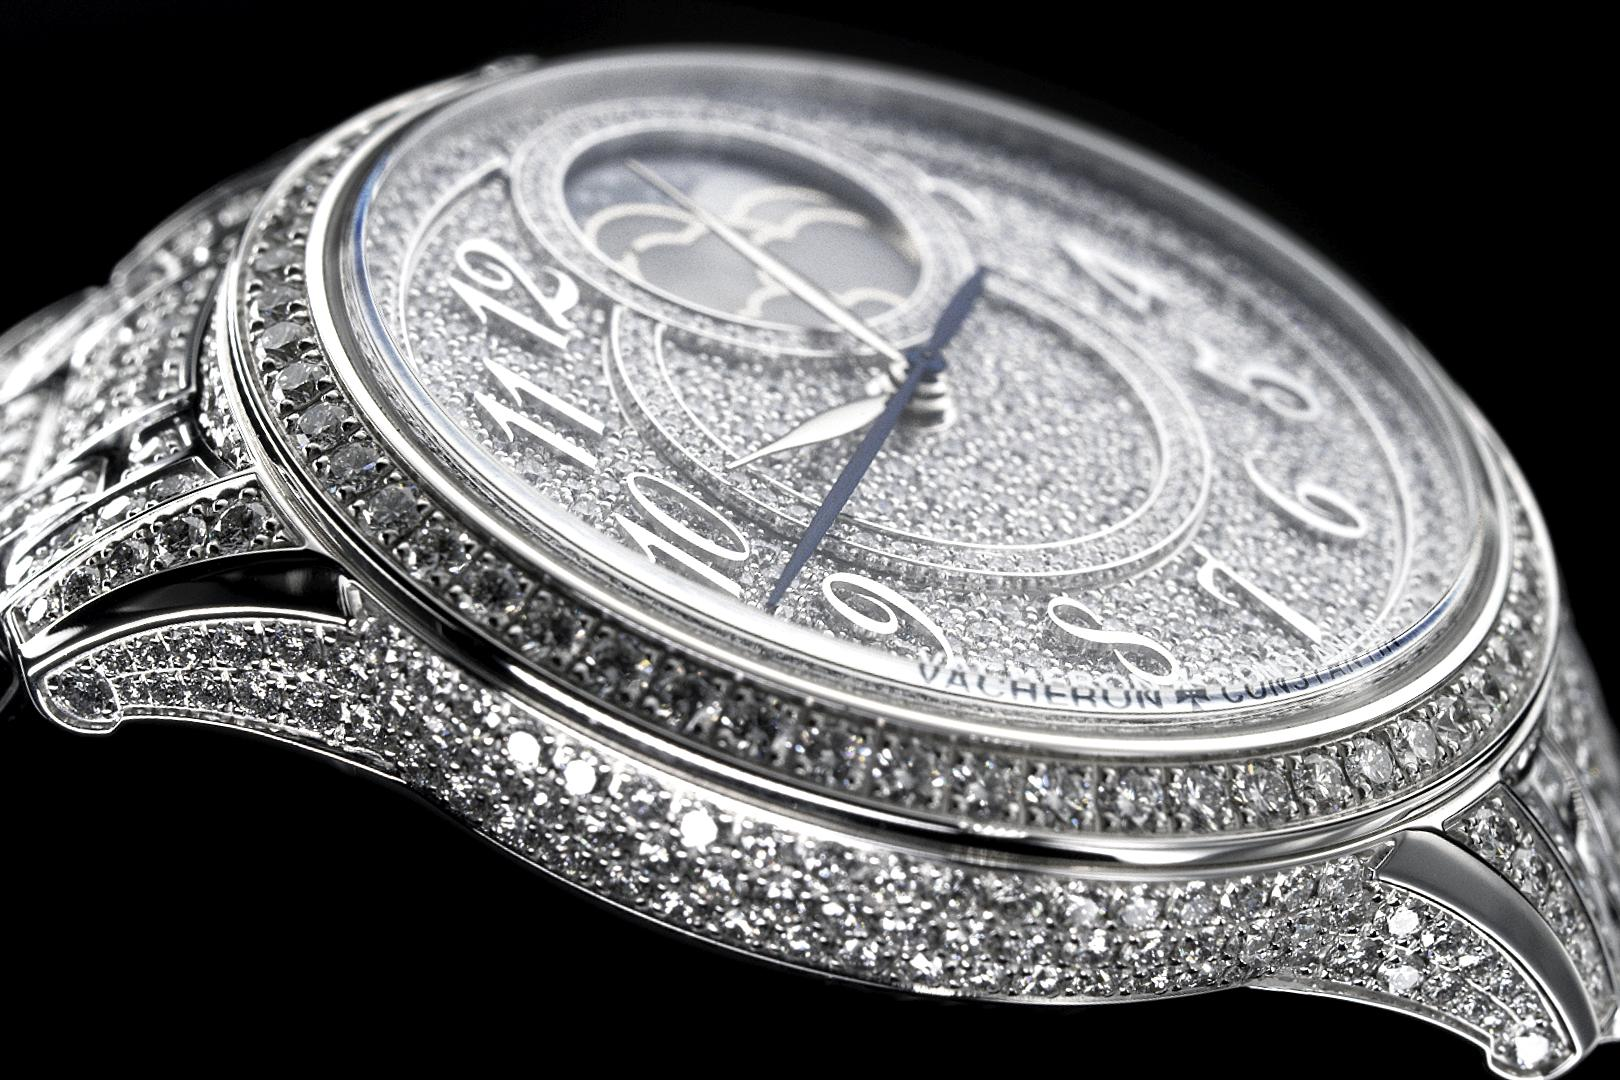 Égérie moon phase jewellery © Vacheron Constantin